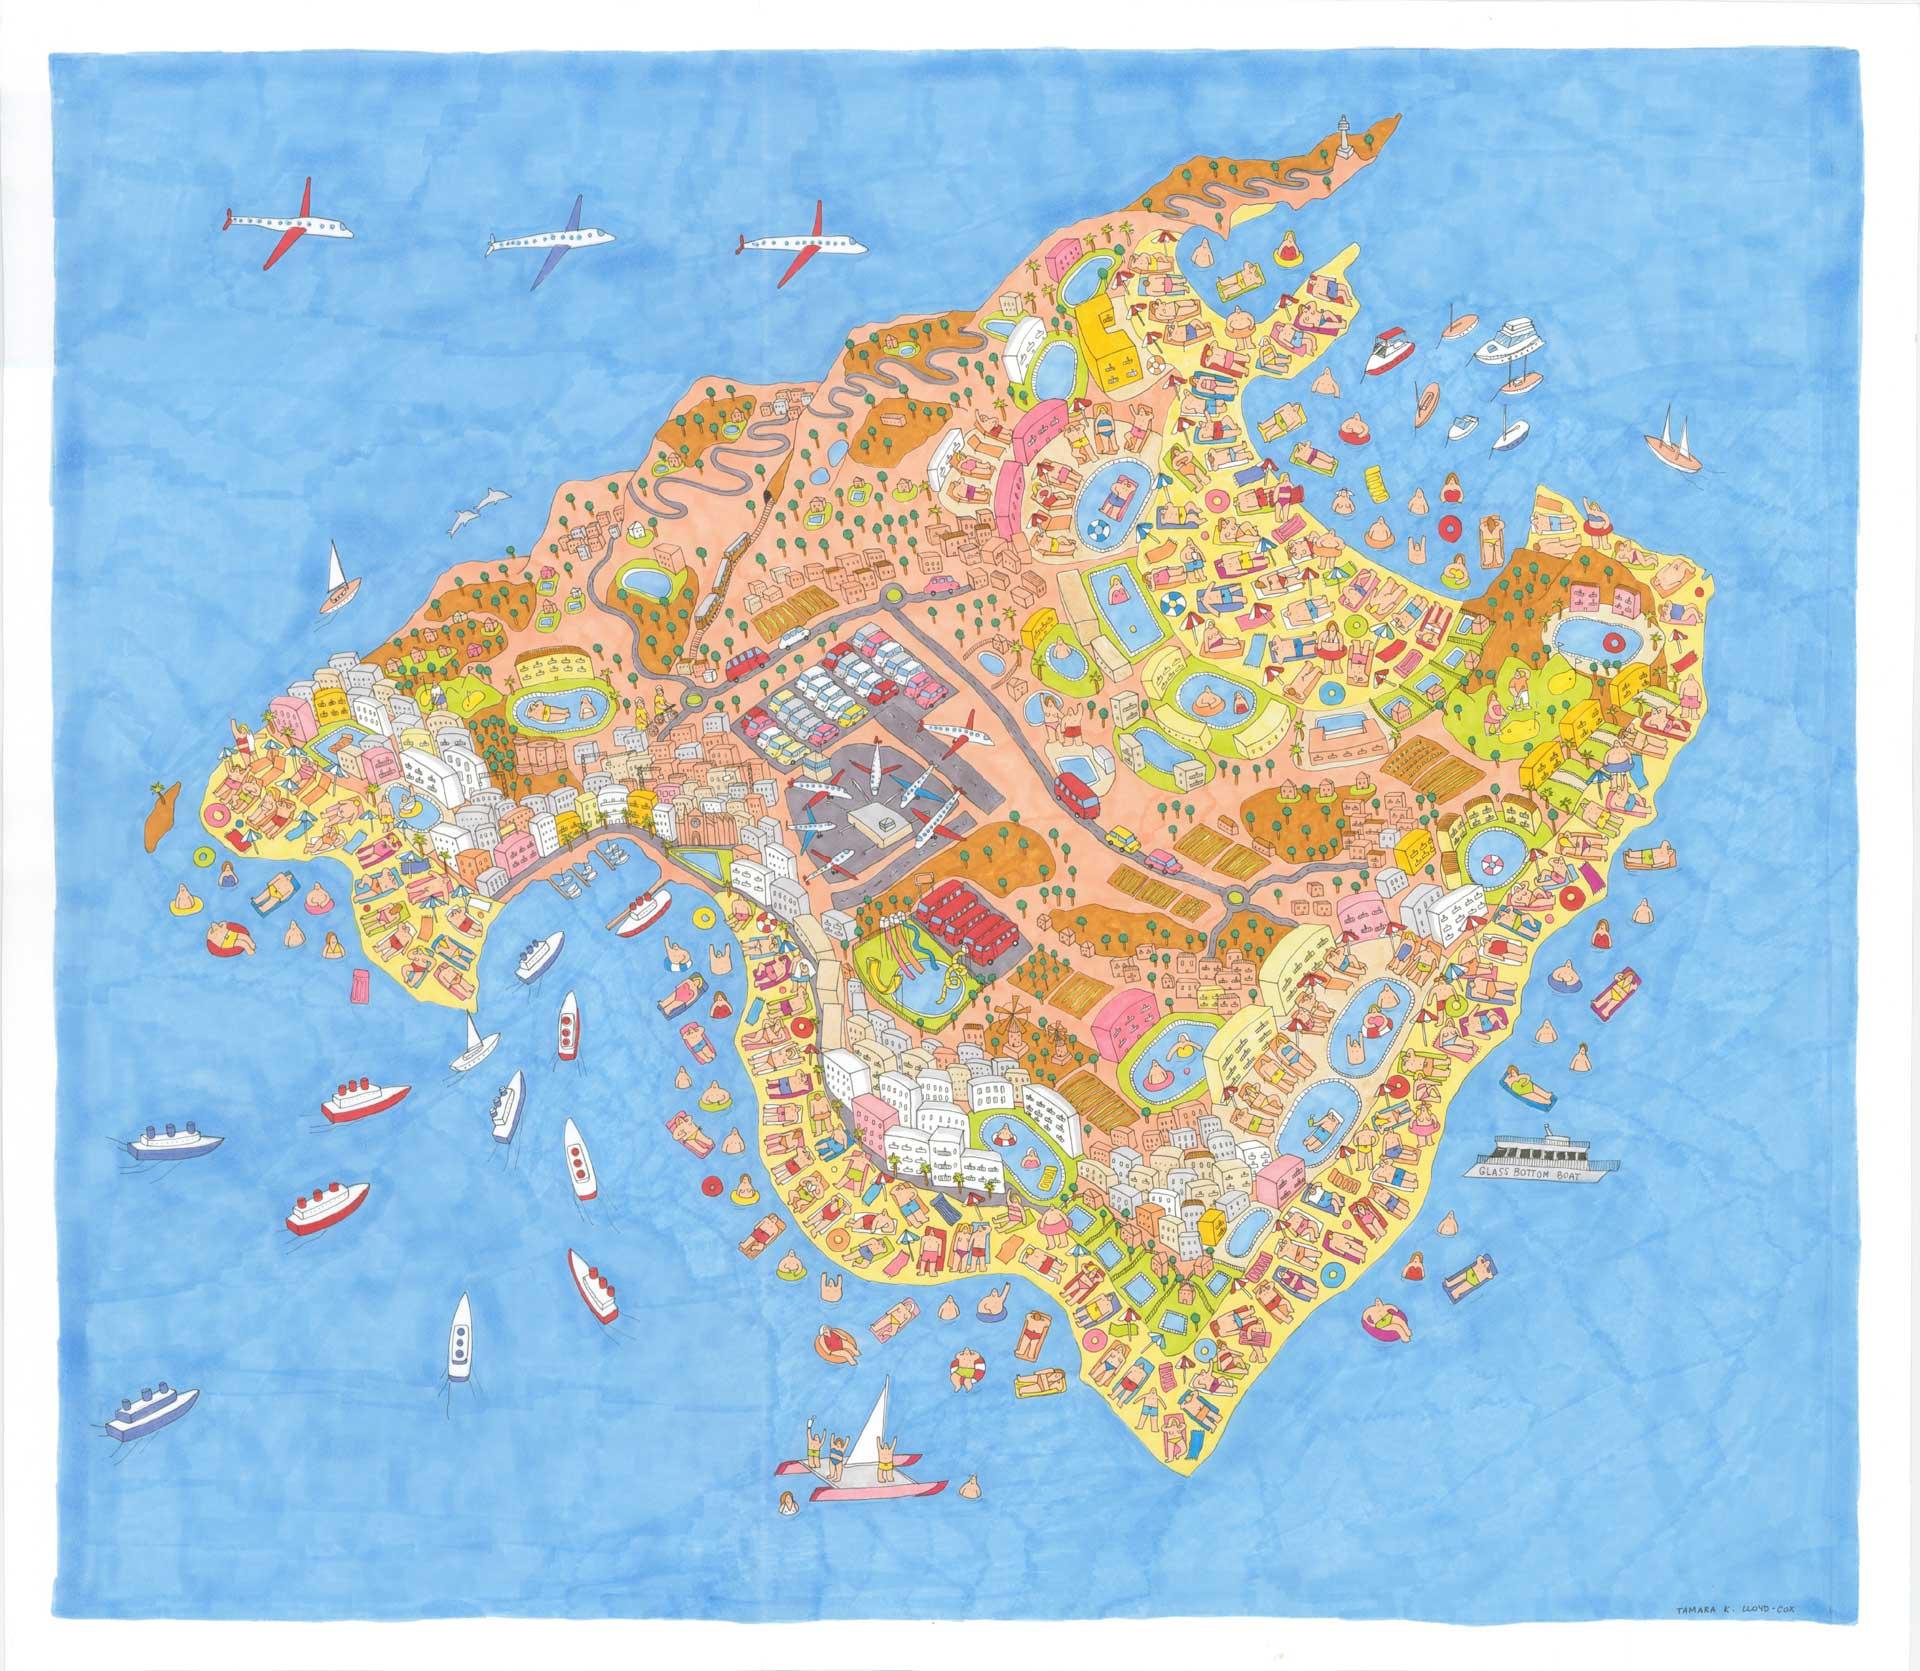 Illustrated Mallorca Map   Print Only on malta map, catalonia independence map, mediterranean sea map, barcelona map, canary islands map, palma map, world map, menorca map, lanzarote map, hong kong map, pyrenees mountains map, copenhagen map, naples map, majorca map, croatia map, ibiza map, malaga map, poland map, marseille map,